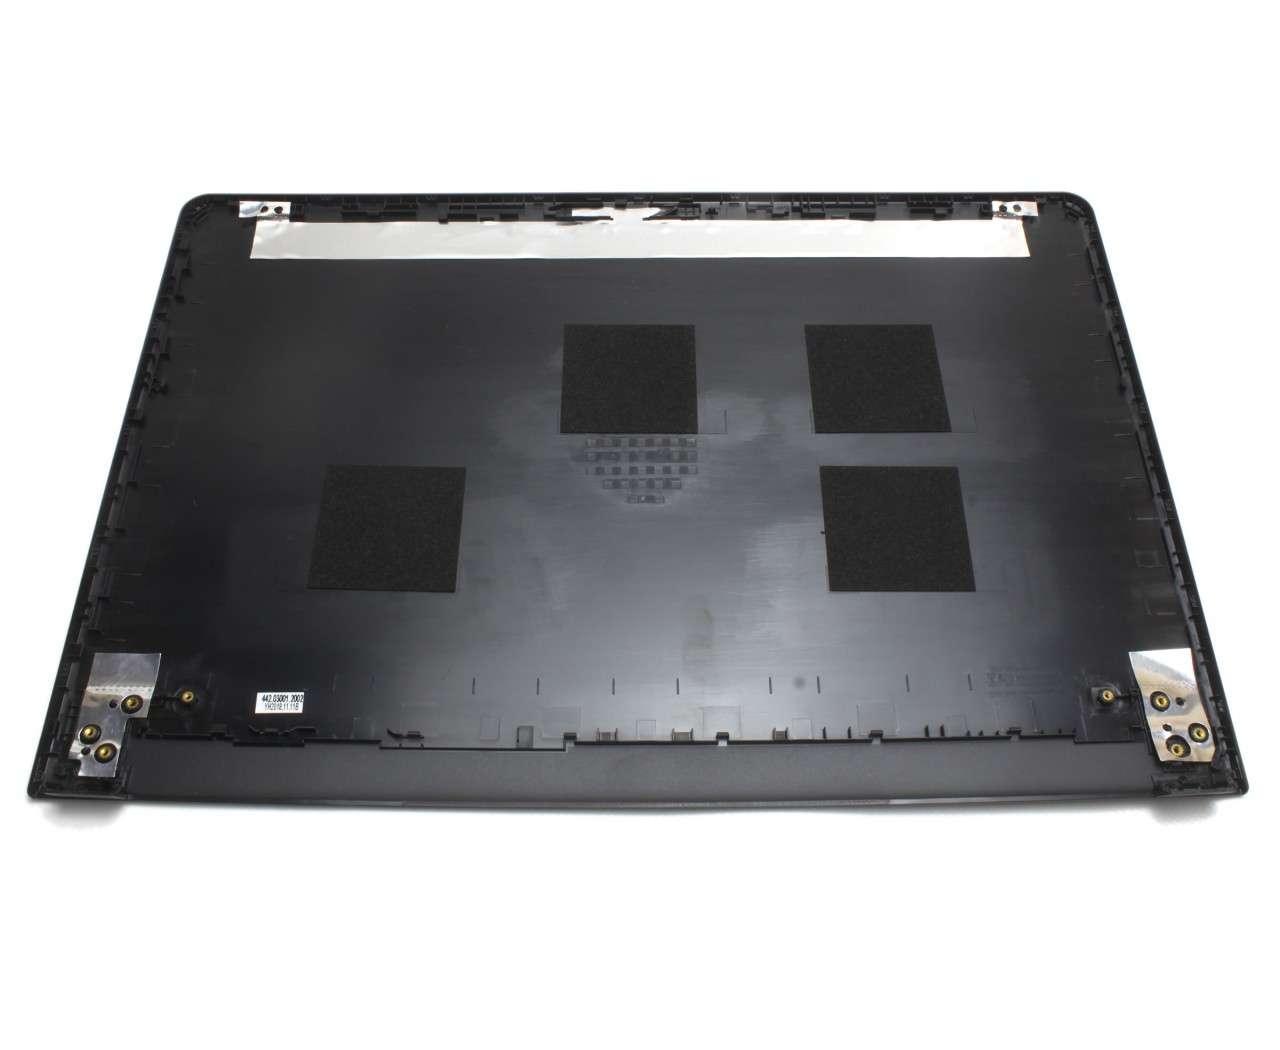 Capac Display BackCover Dell Inspiron 3565 Carcasa Display pentru laptop cu touchscreen imagine powerlaptop.ro 2021